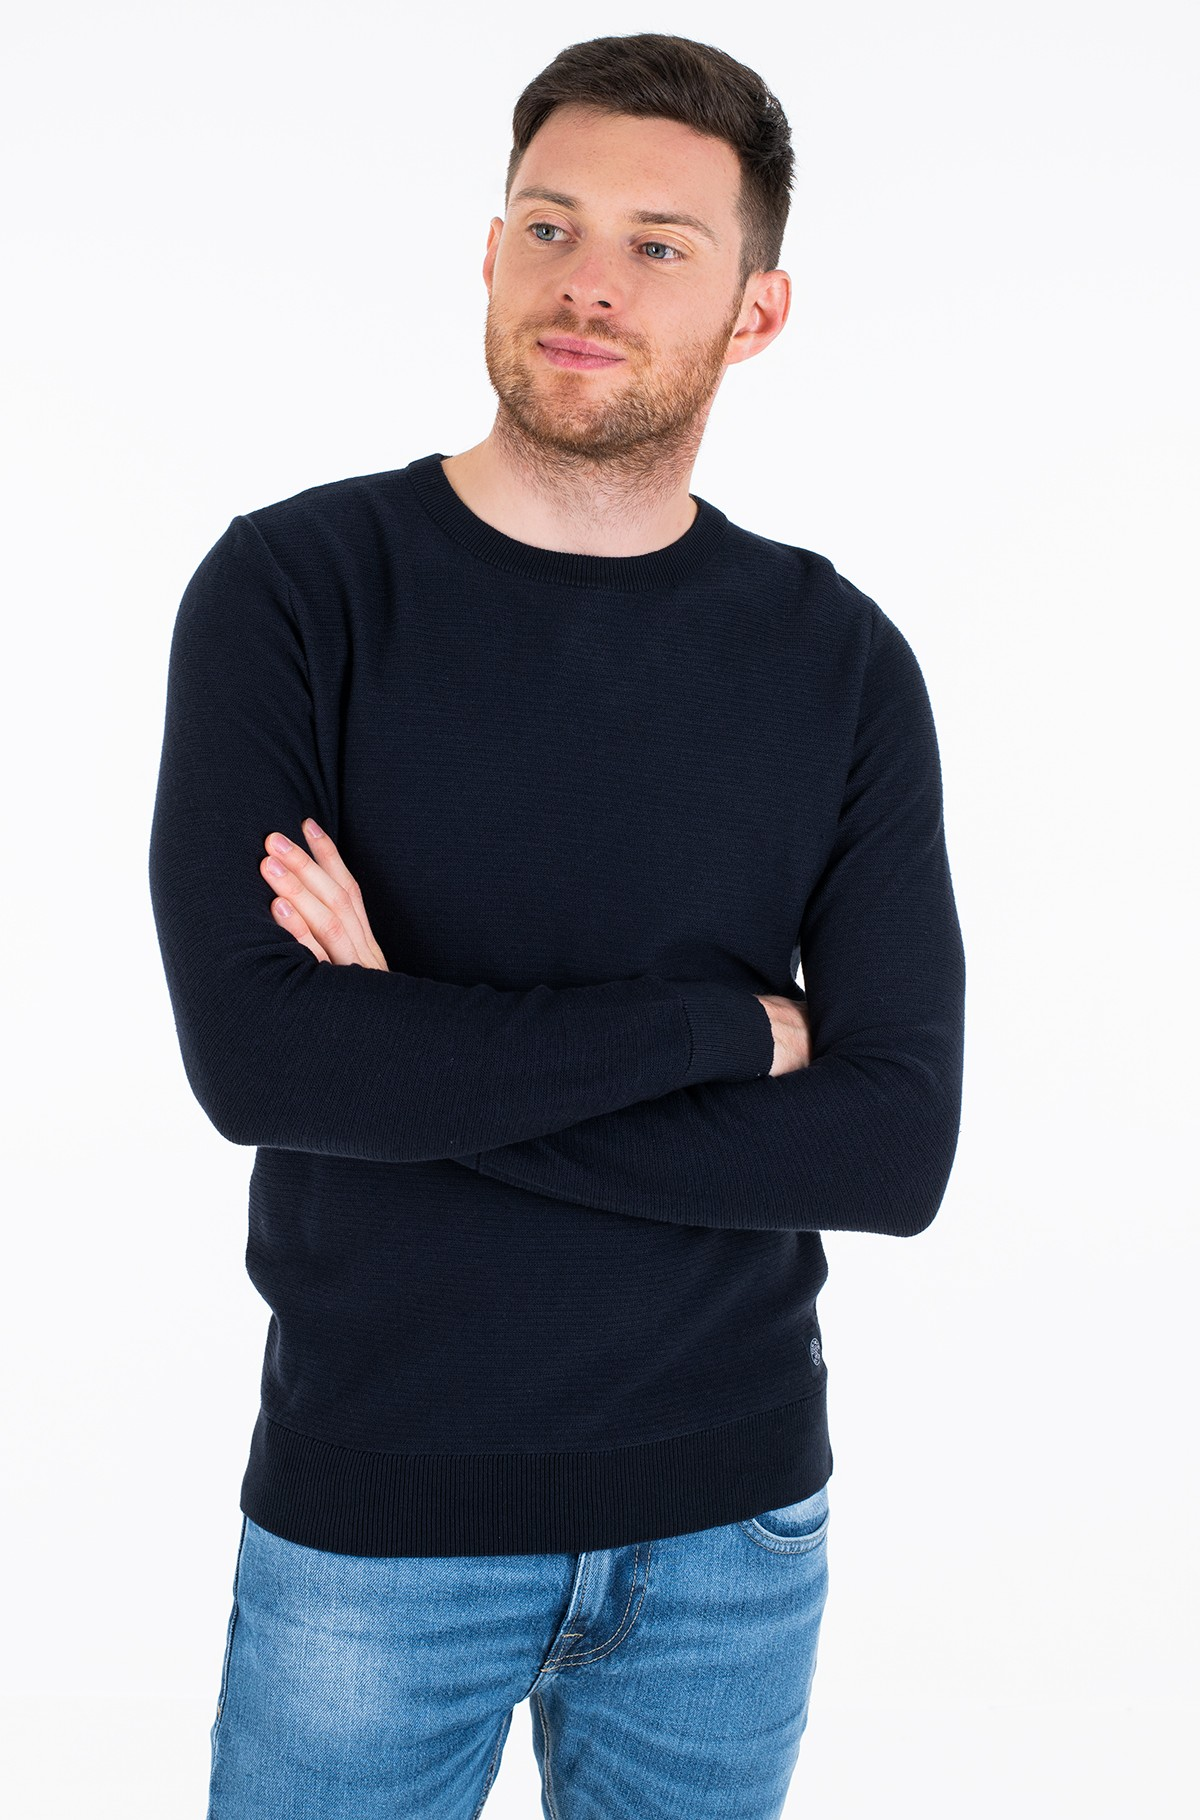 Sweater 1020416-full-1